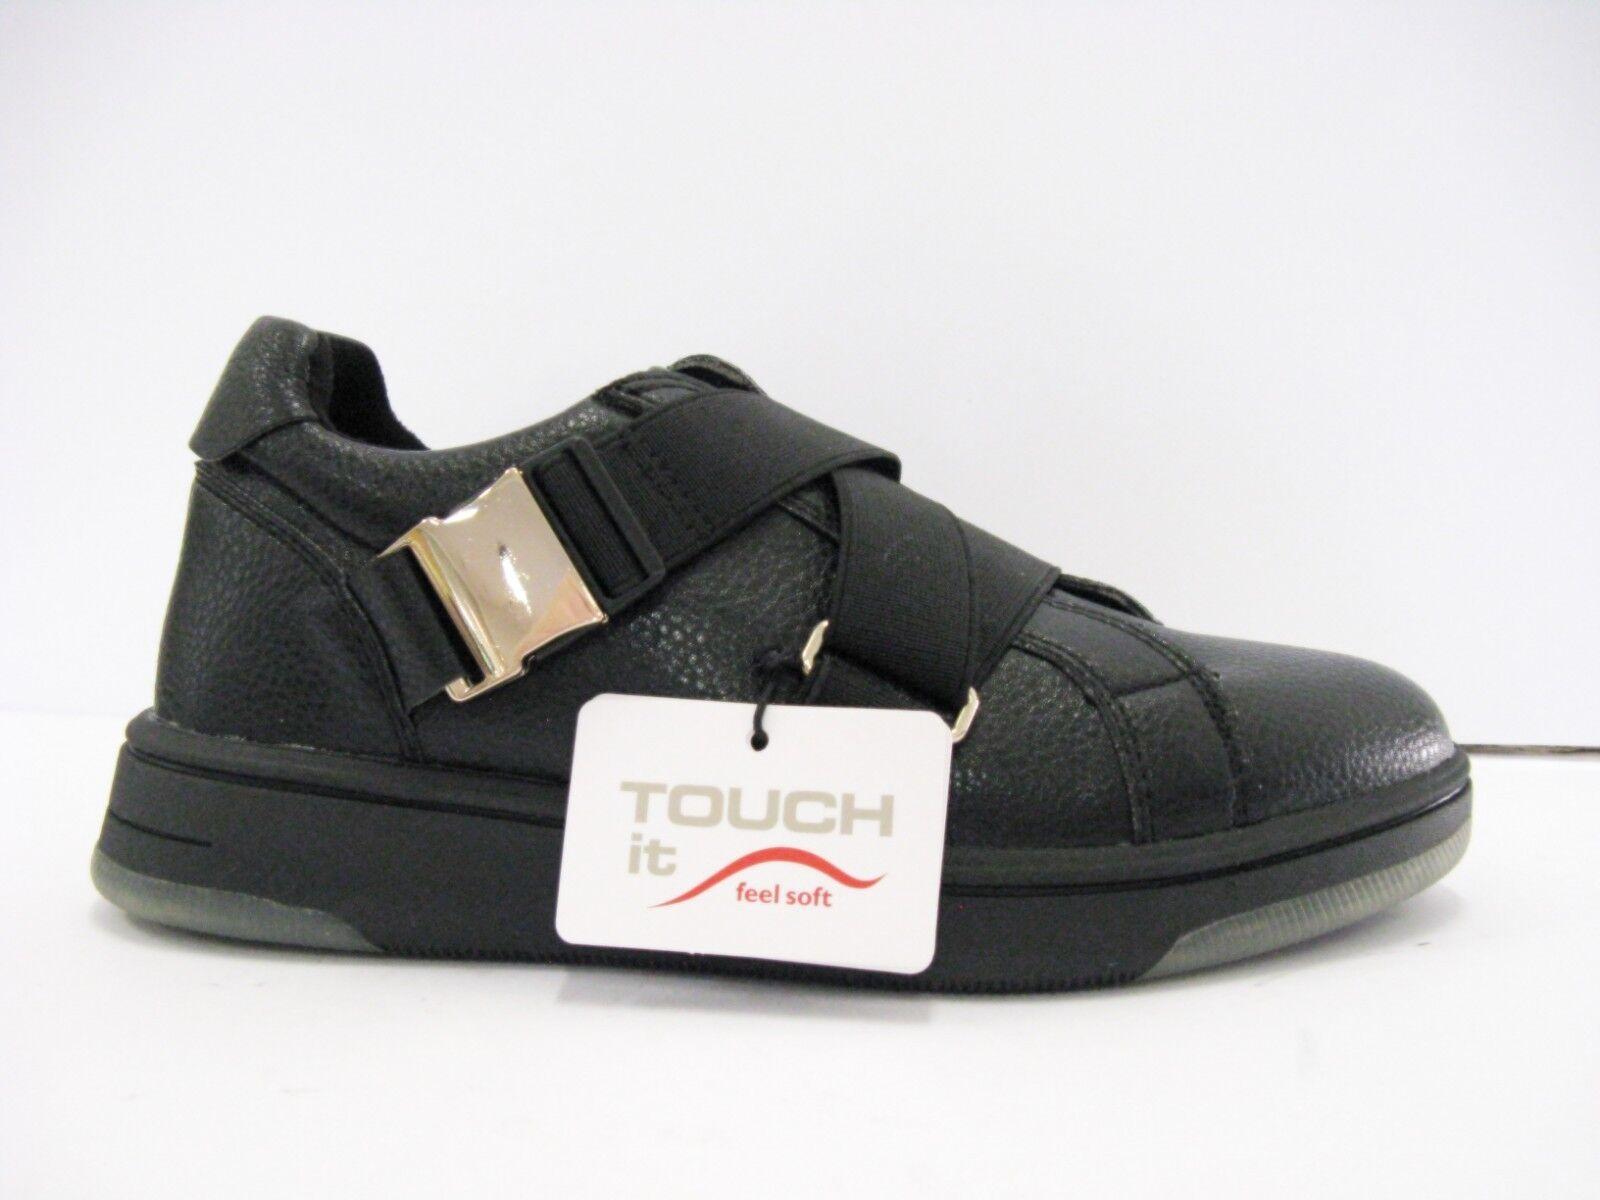 TAMARIS 24708 29 001 scarpe nera da ginnastica donna fibbie nera scarpe suola gomma inserto antiscivolo 0f0c1c